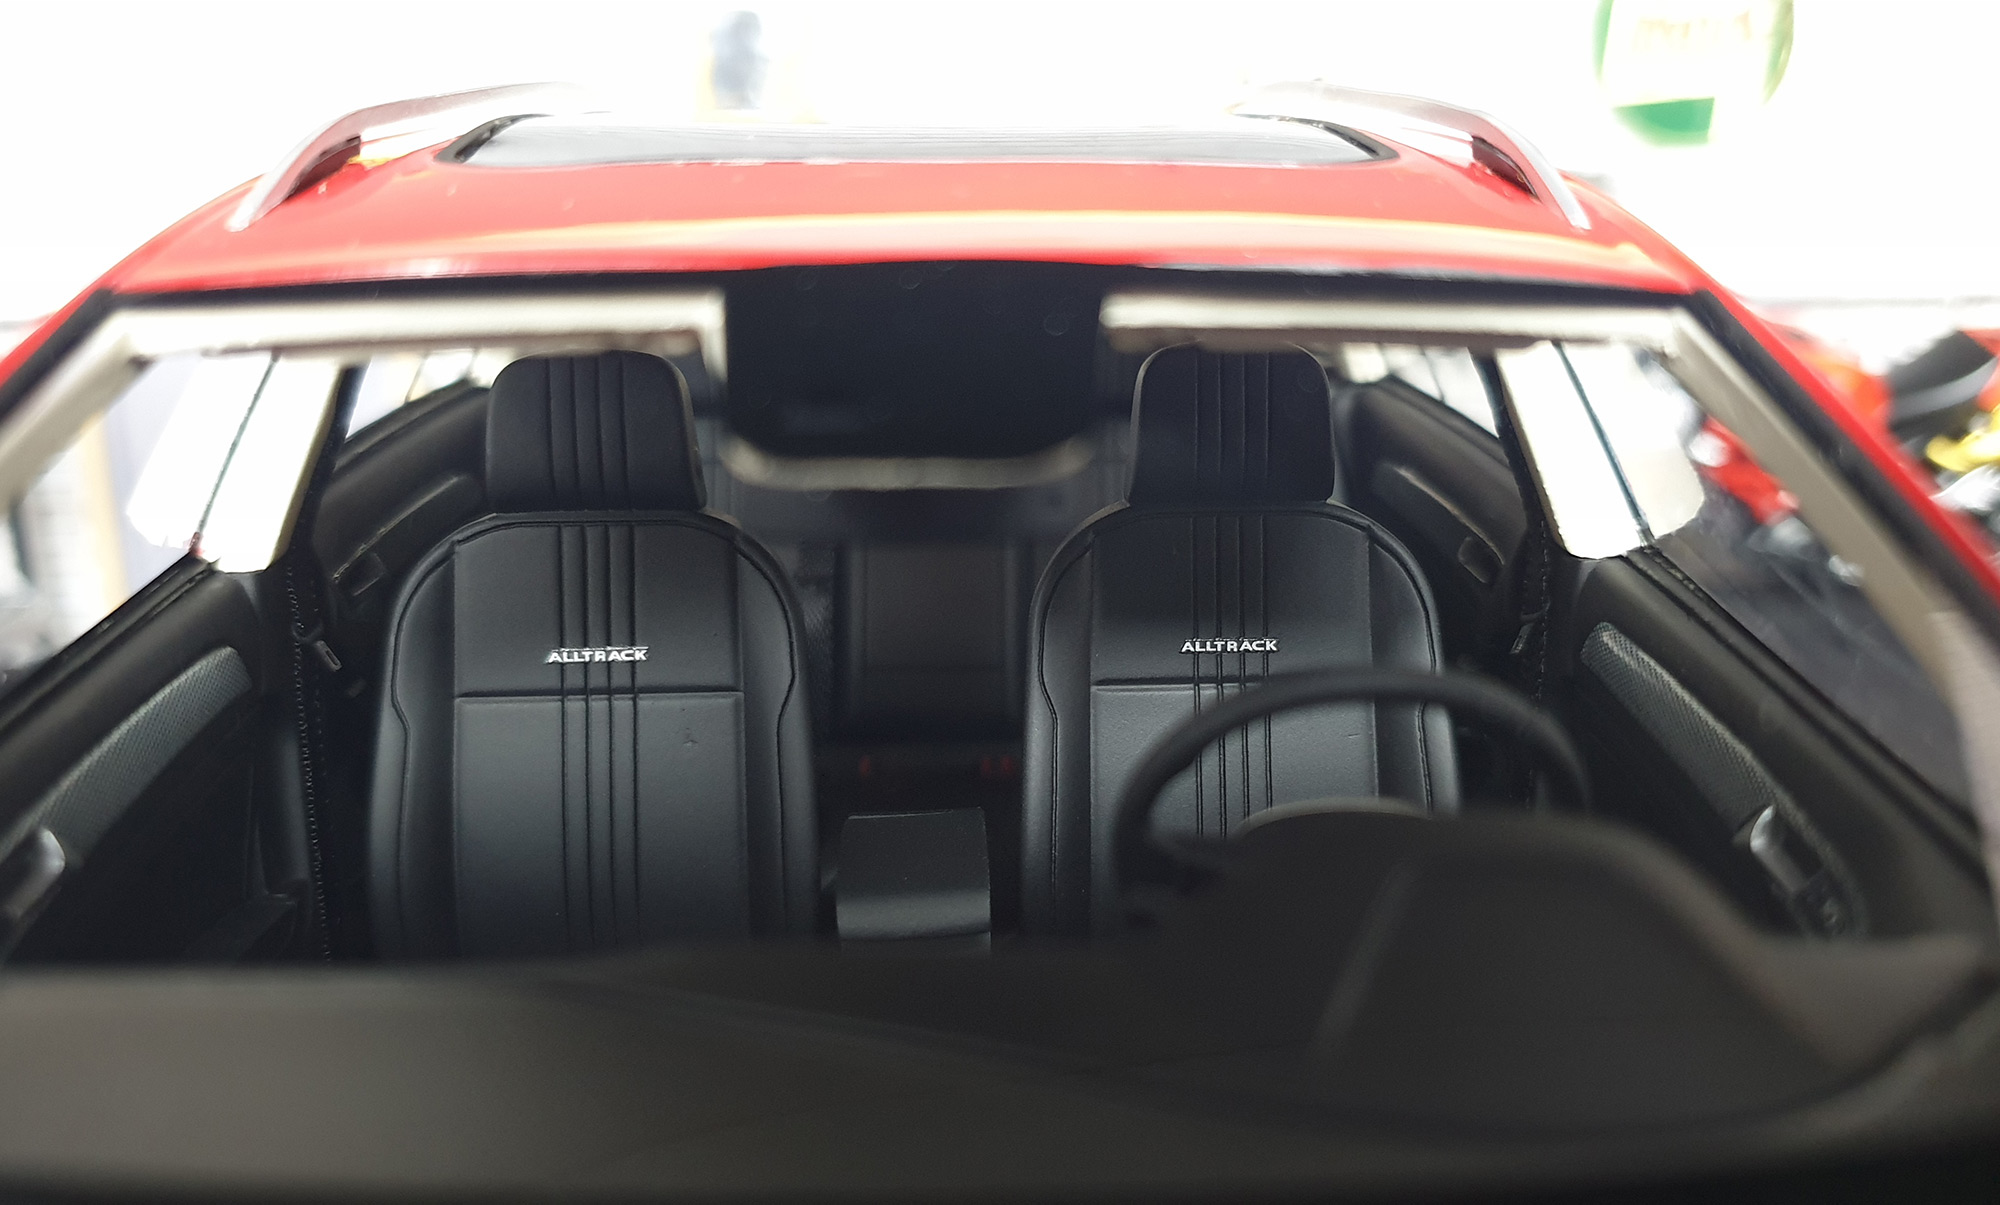 Volkswagen Golf 7 Alltrack DNA Collectibles 1/18 DNA000035 Intérieur